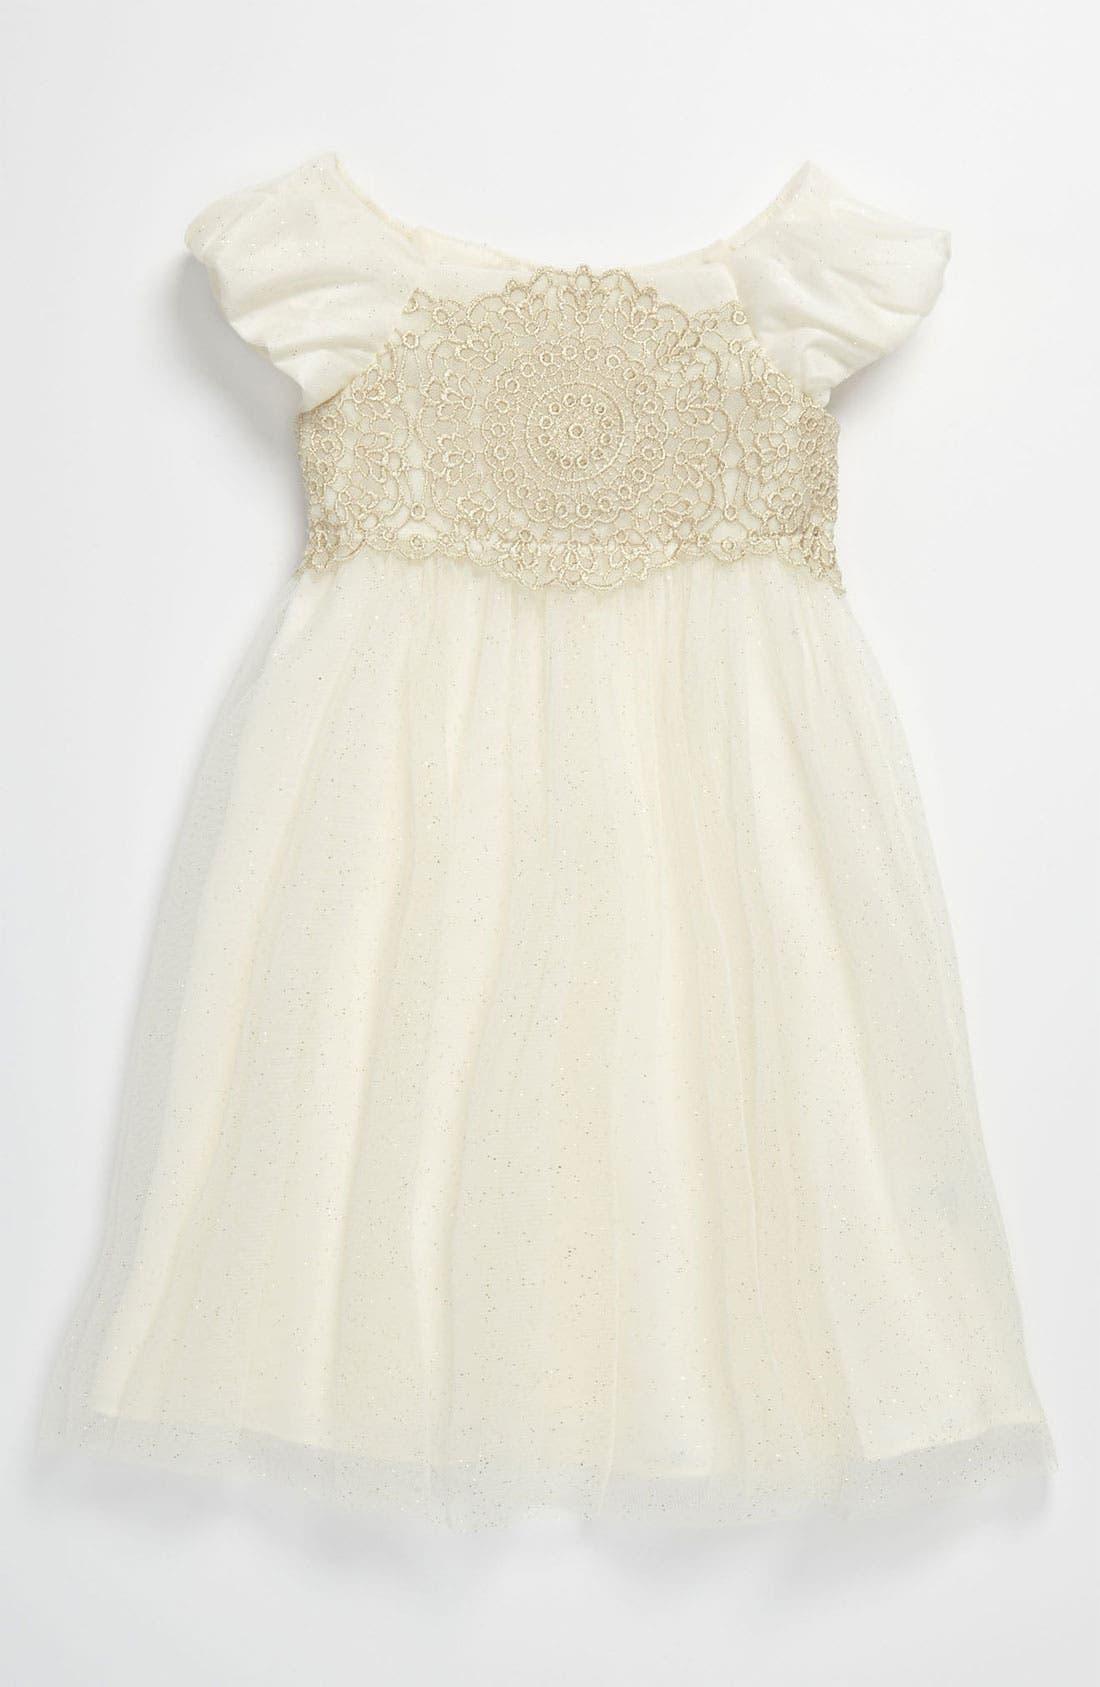 Main Image - Sweet Heart Rose Lace Empire Waist Glitter Dress (Toddler)